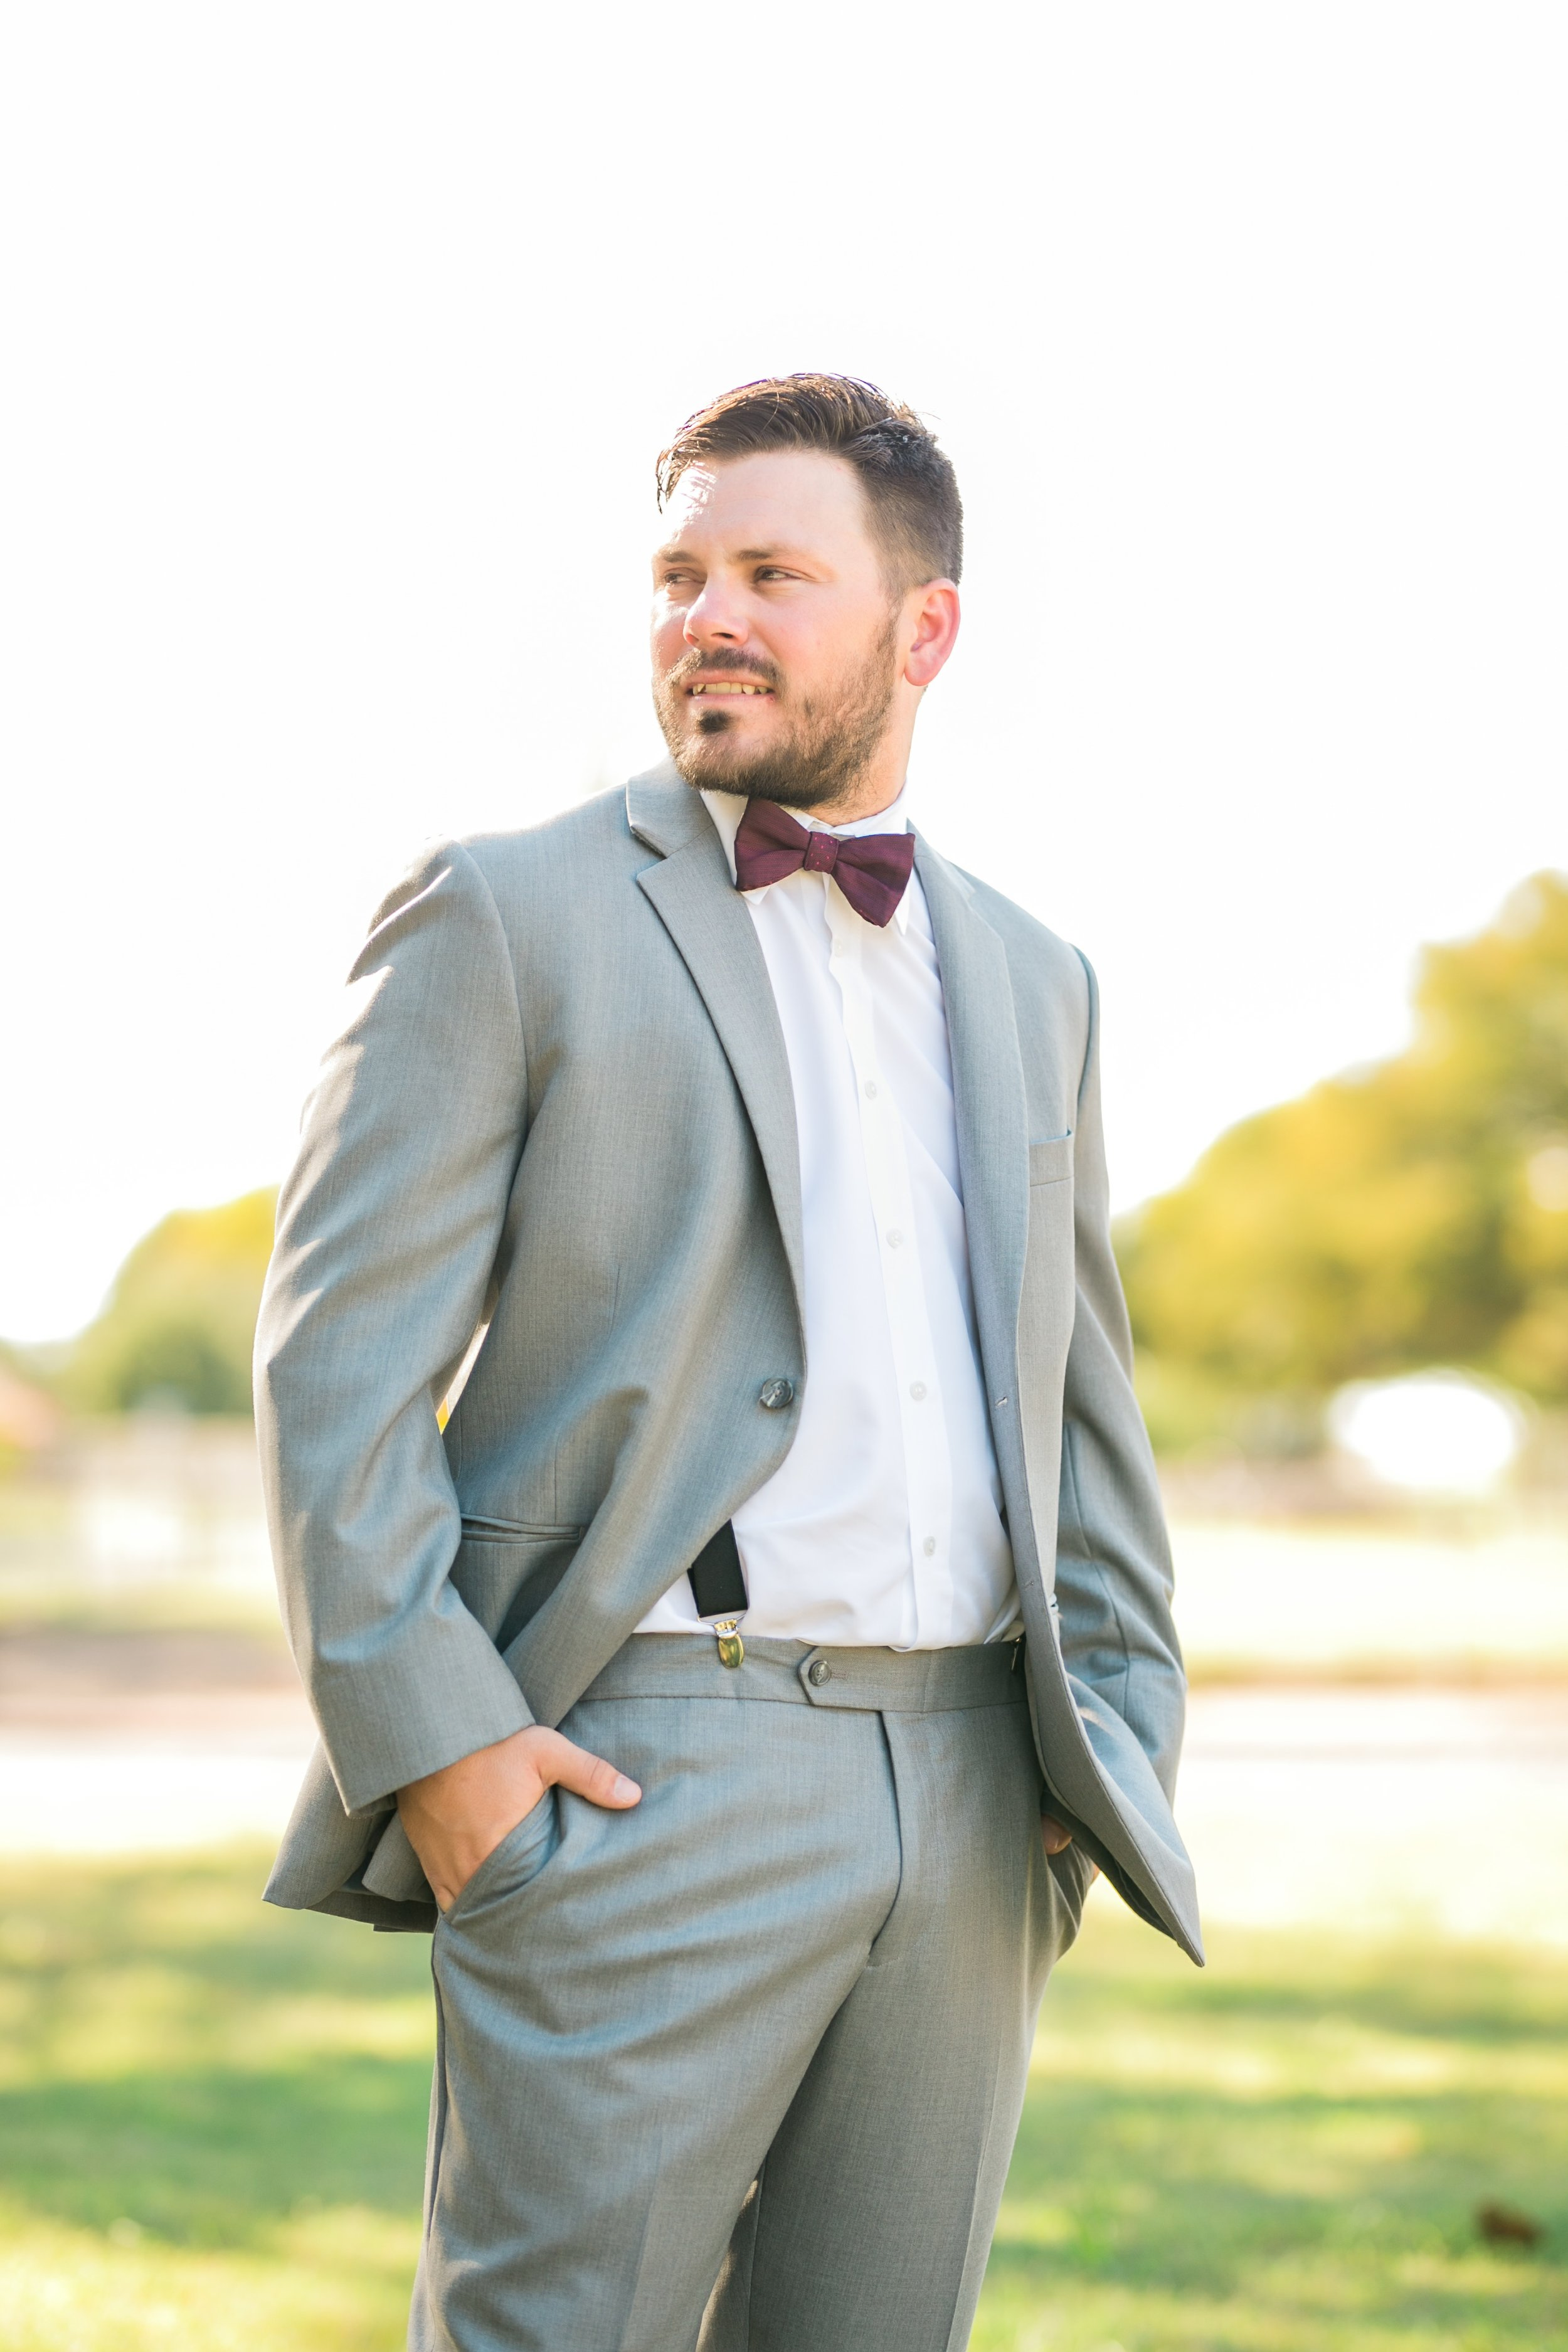 Roberson-Wedding-The-Forum-Lauren-Pinson-Wedding-Photography-Wichita-Falls-Texas-016.jpg